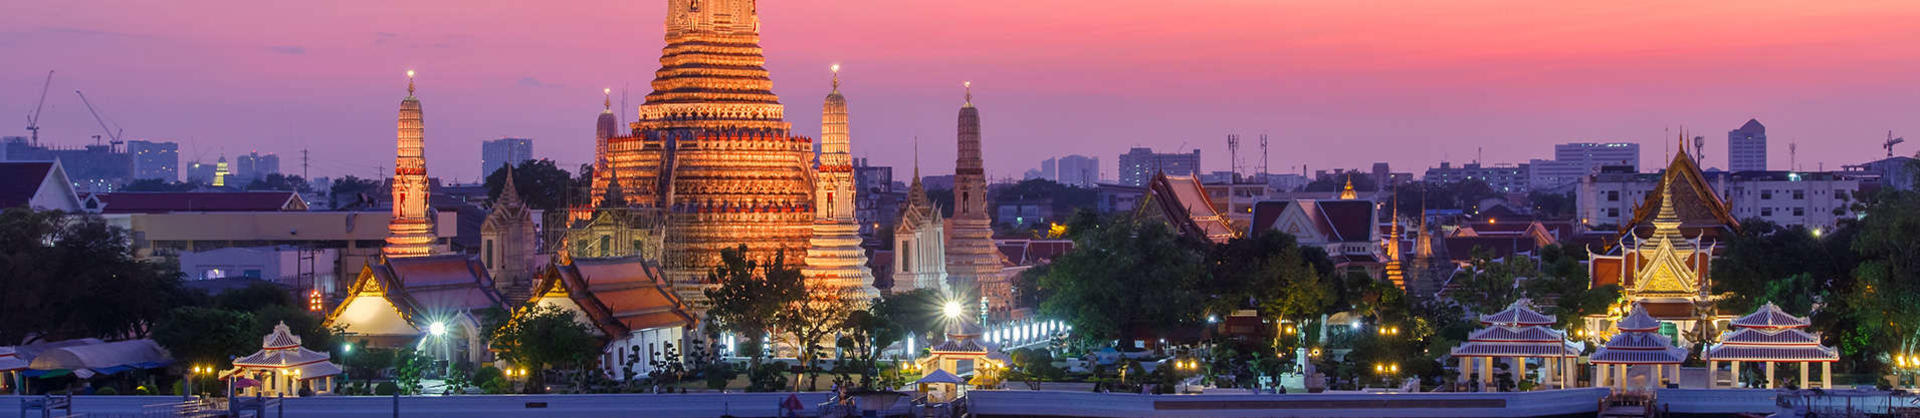 Bangkok city skyline at sunset